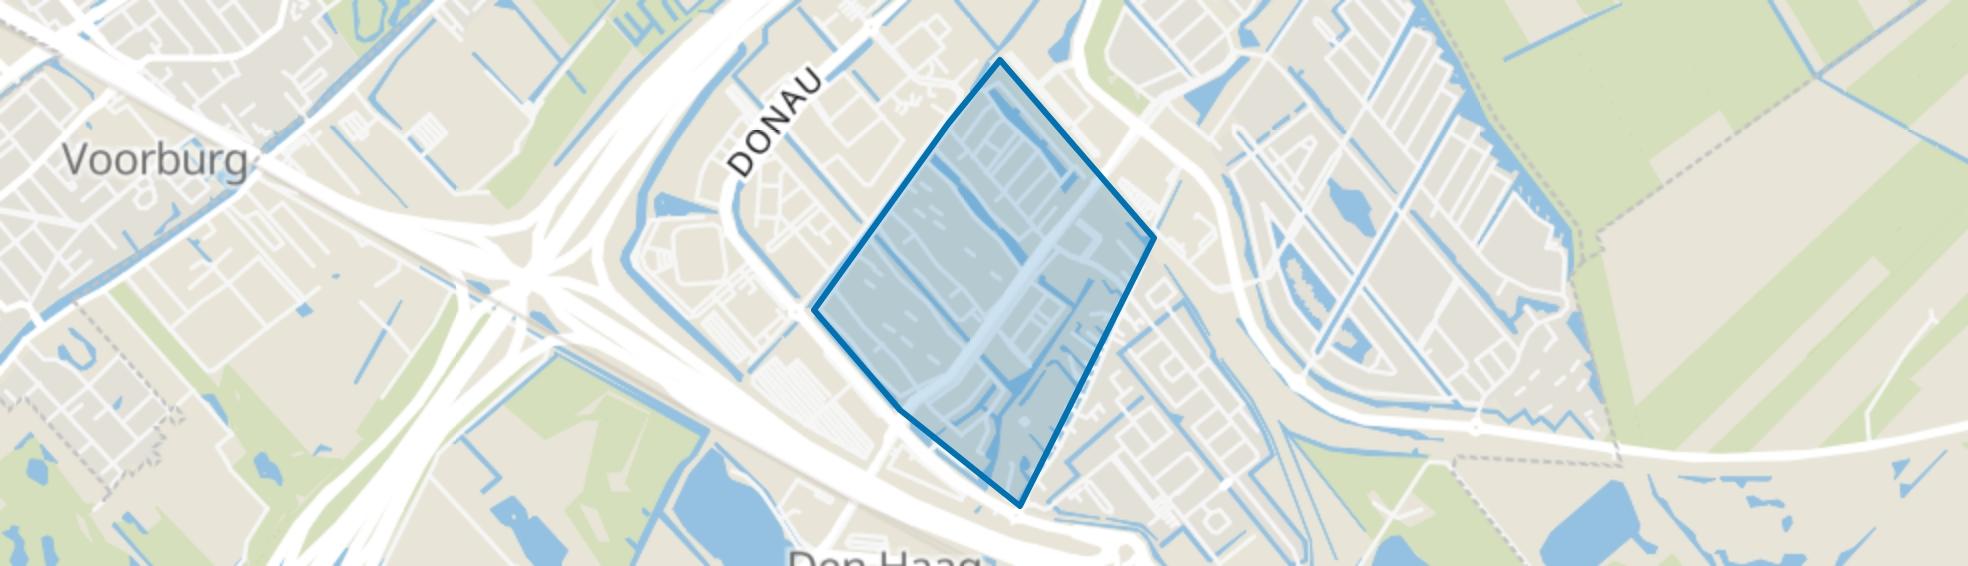 De Lanen, Den Haag map